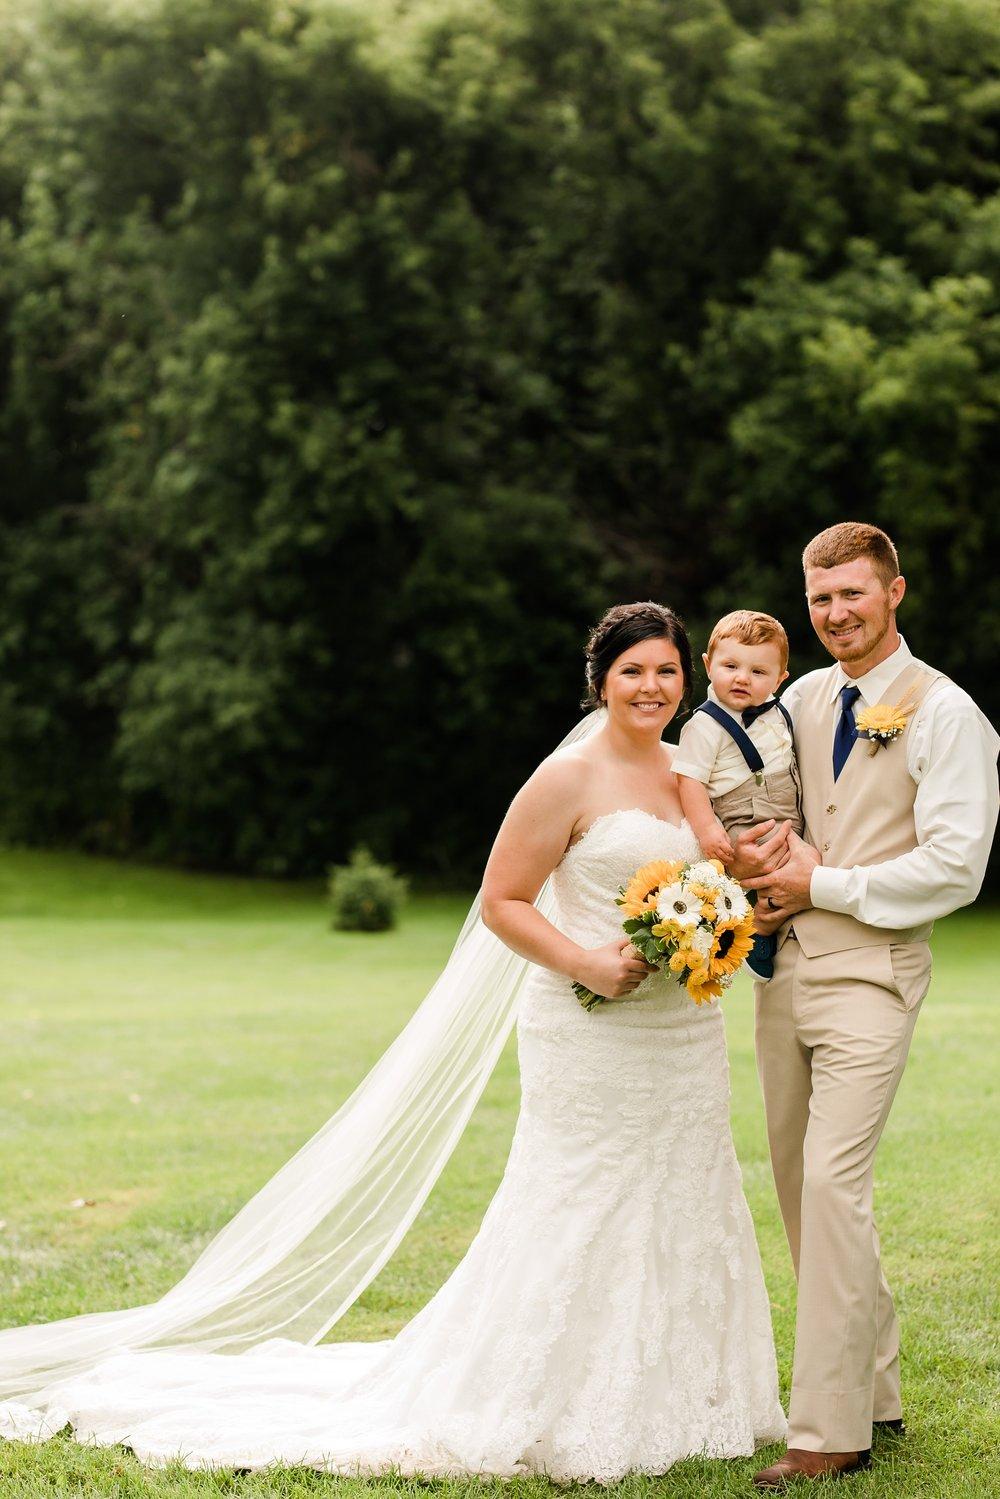 Minnesota Barn Wedding and Outdoor Ceremony at Milts Barn_0321.jpg